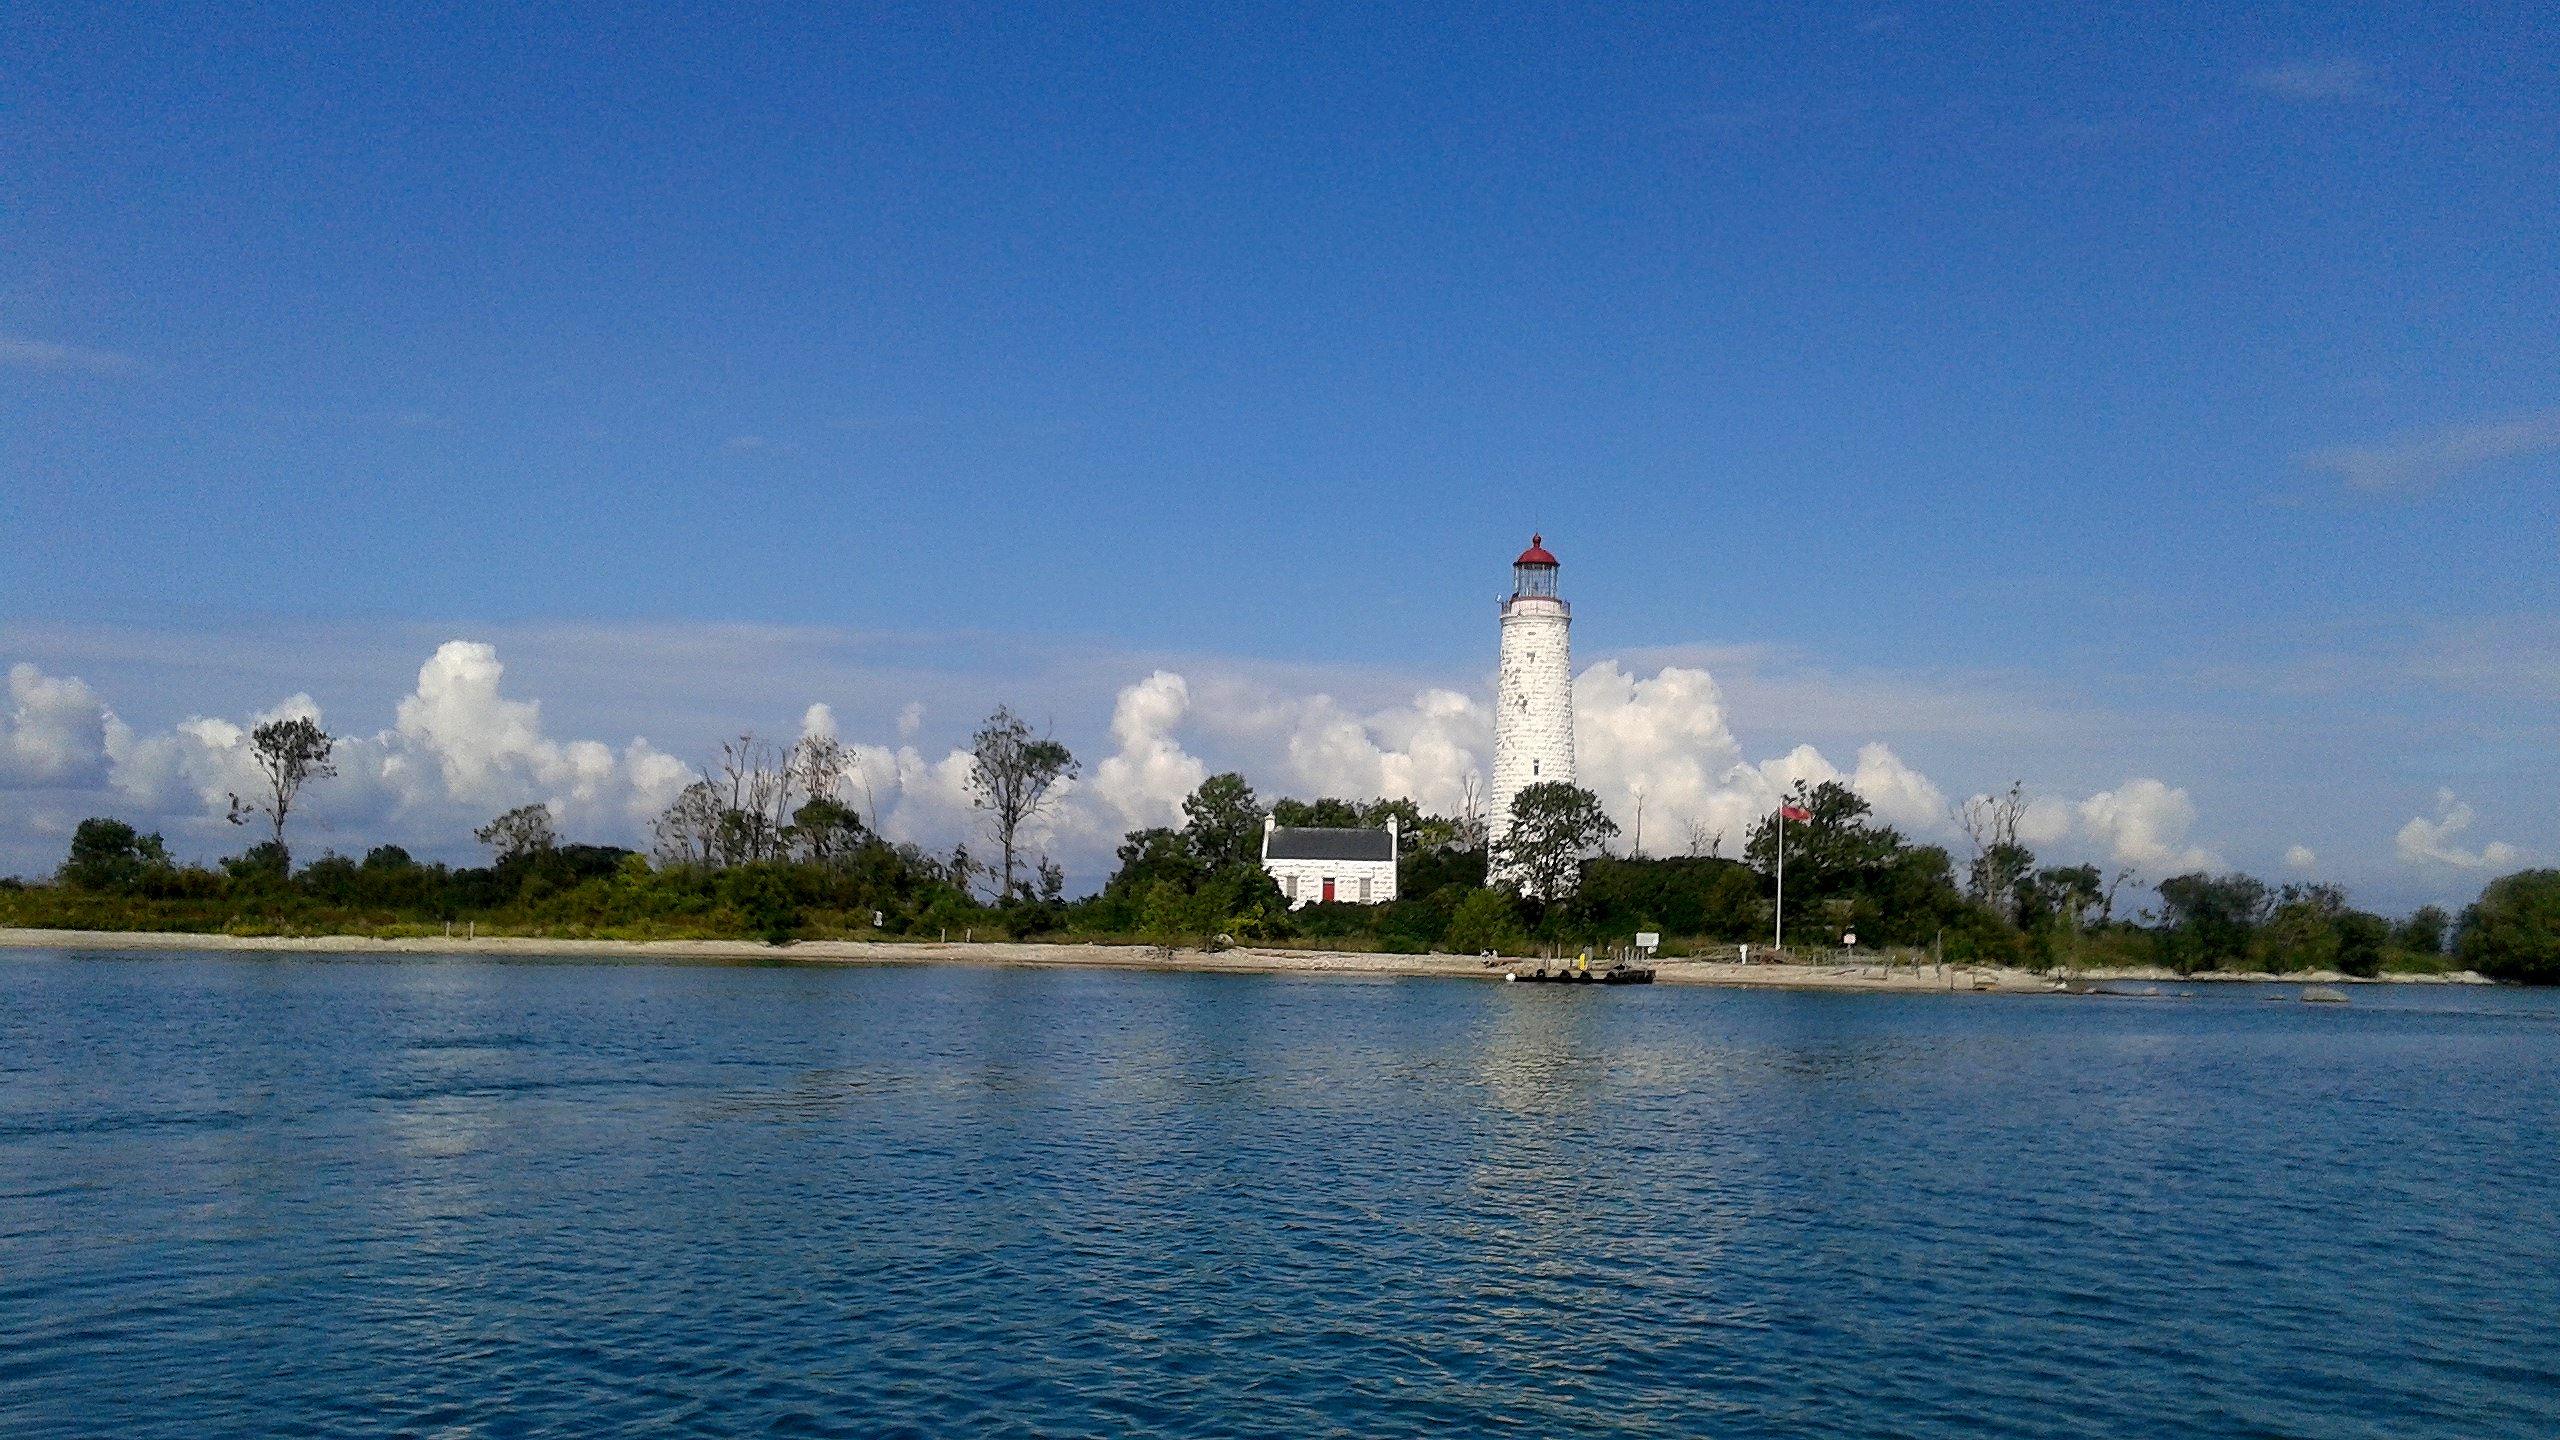 A Tour to Chantry Island